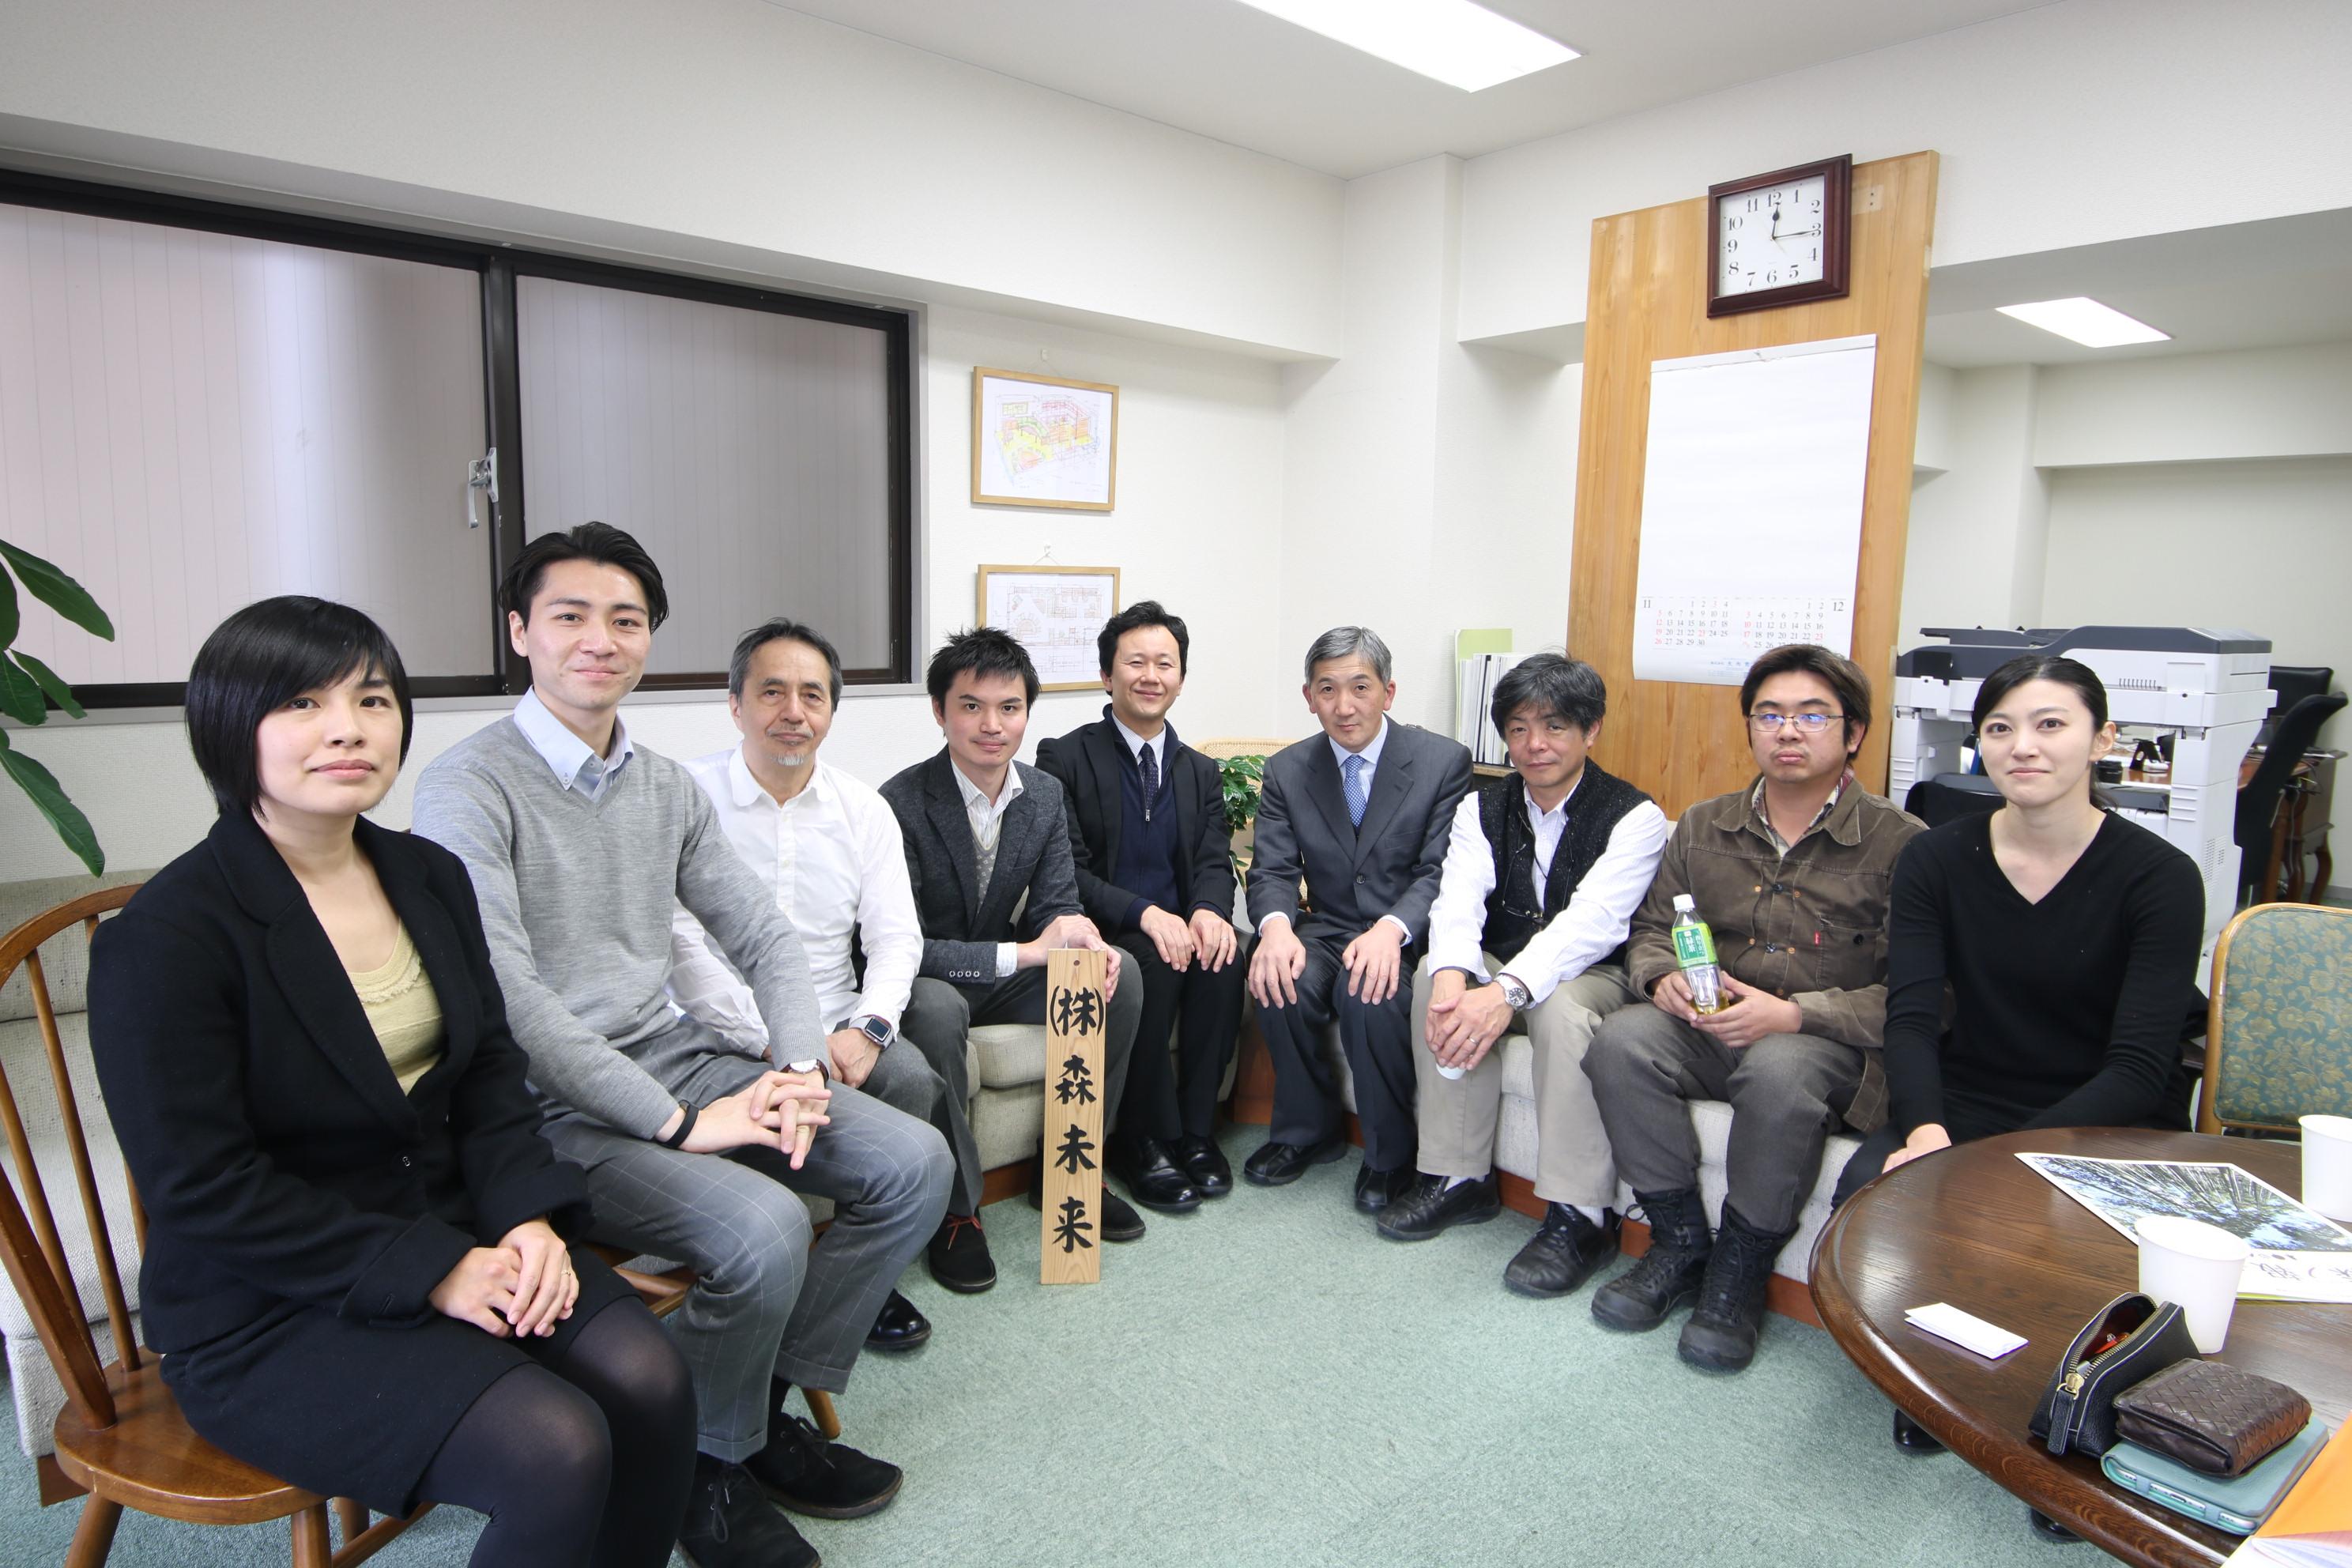 「NEC社会起業塾」第2回VBMを行いました。